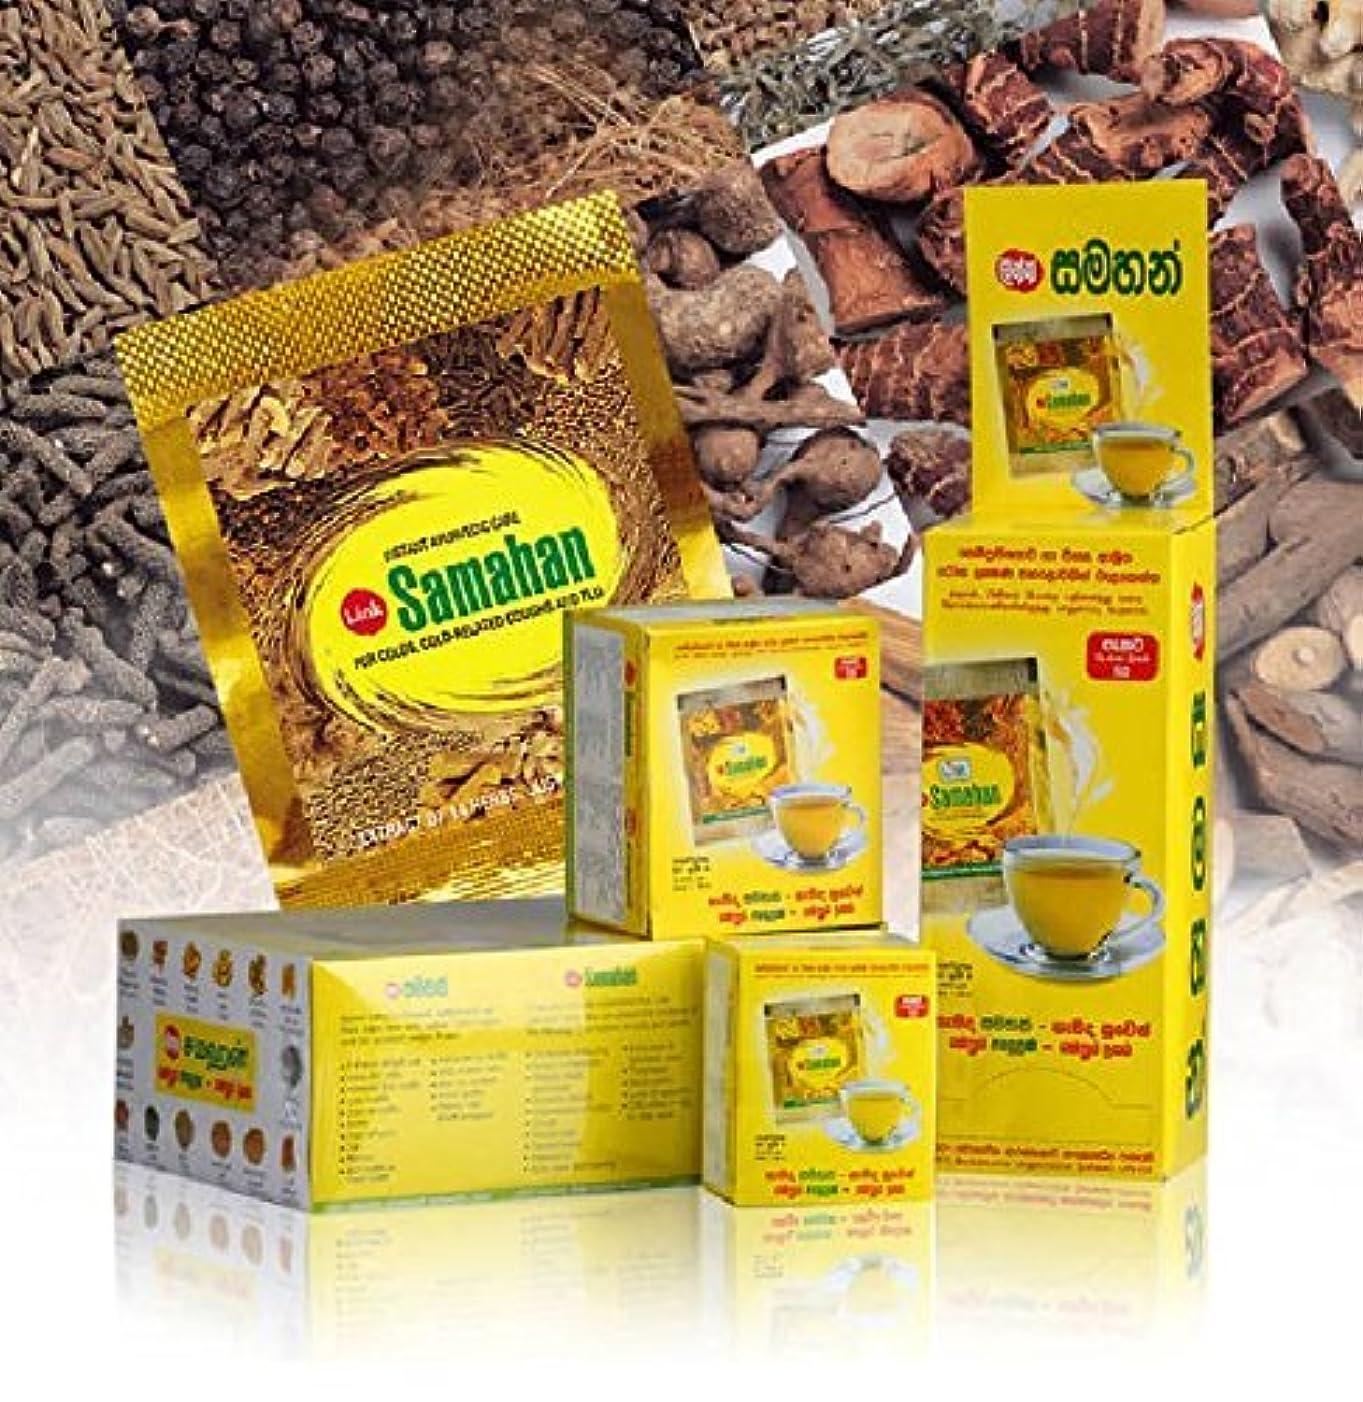 25 Packs Link Samahan Ayurvedic Herbal Tea Packets by link natural